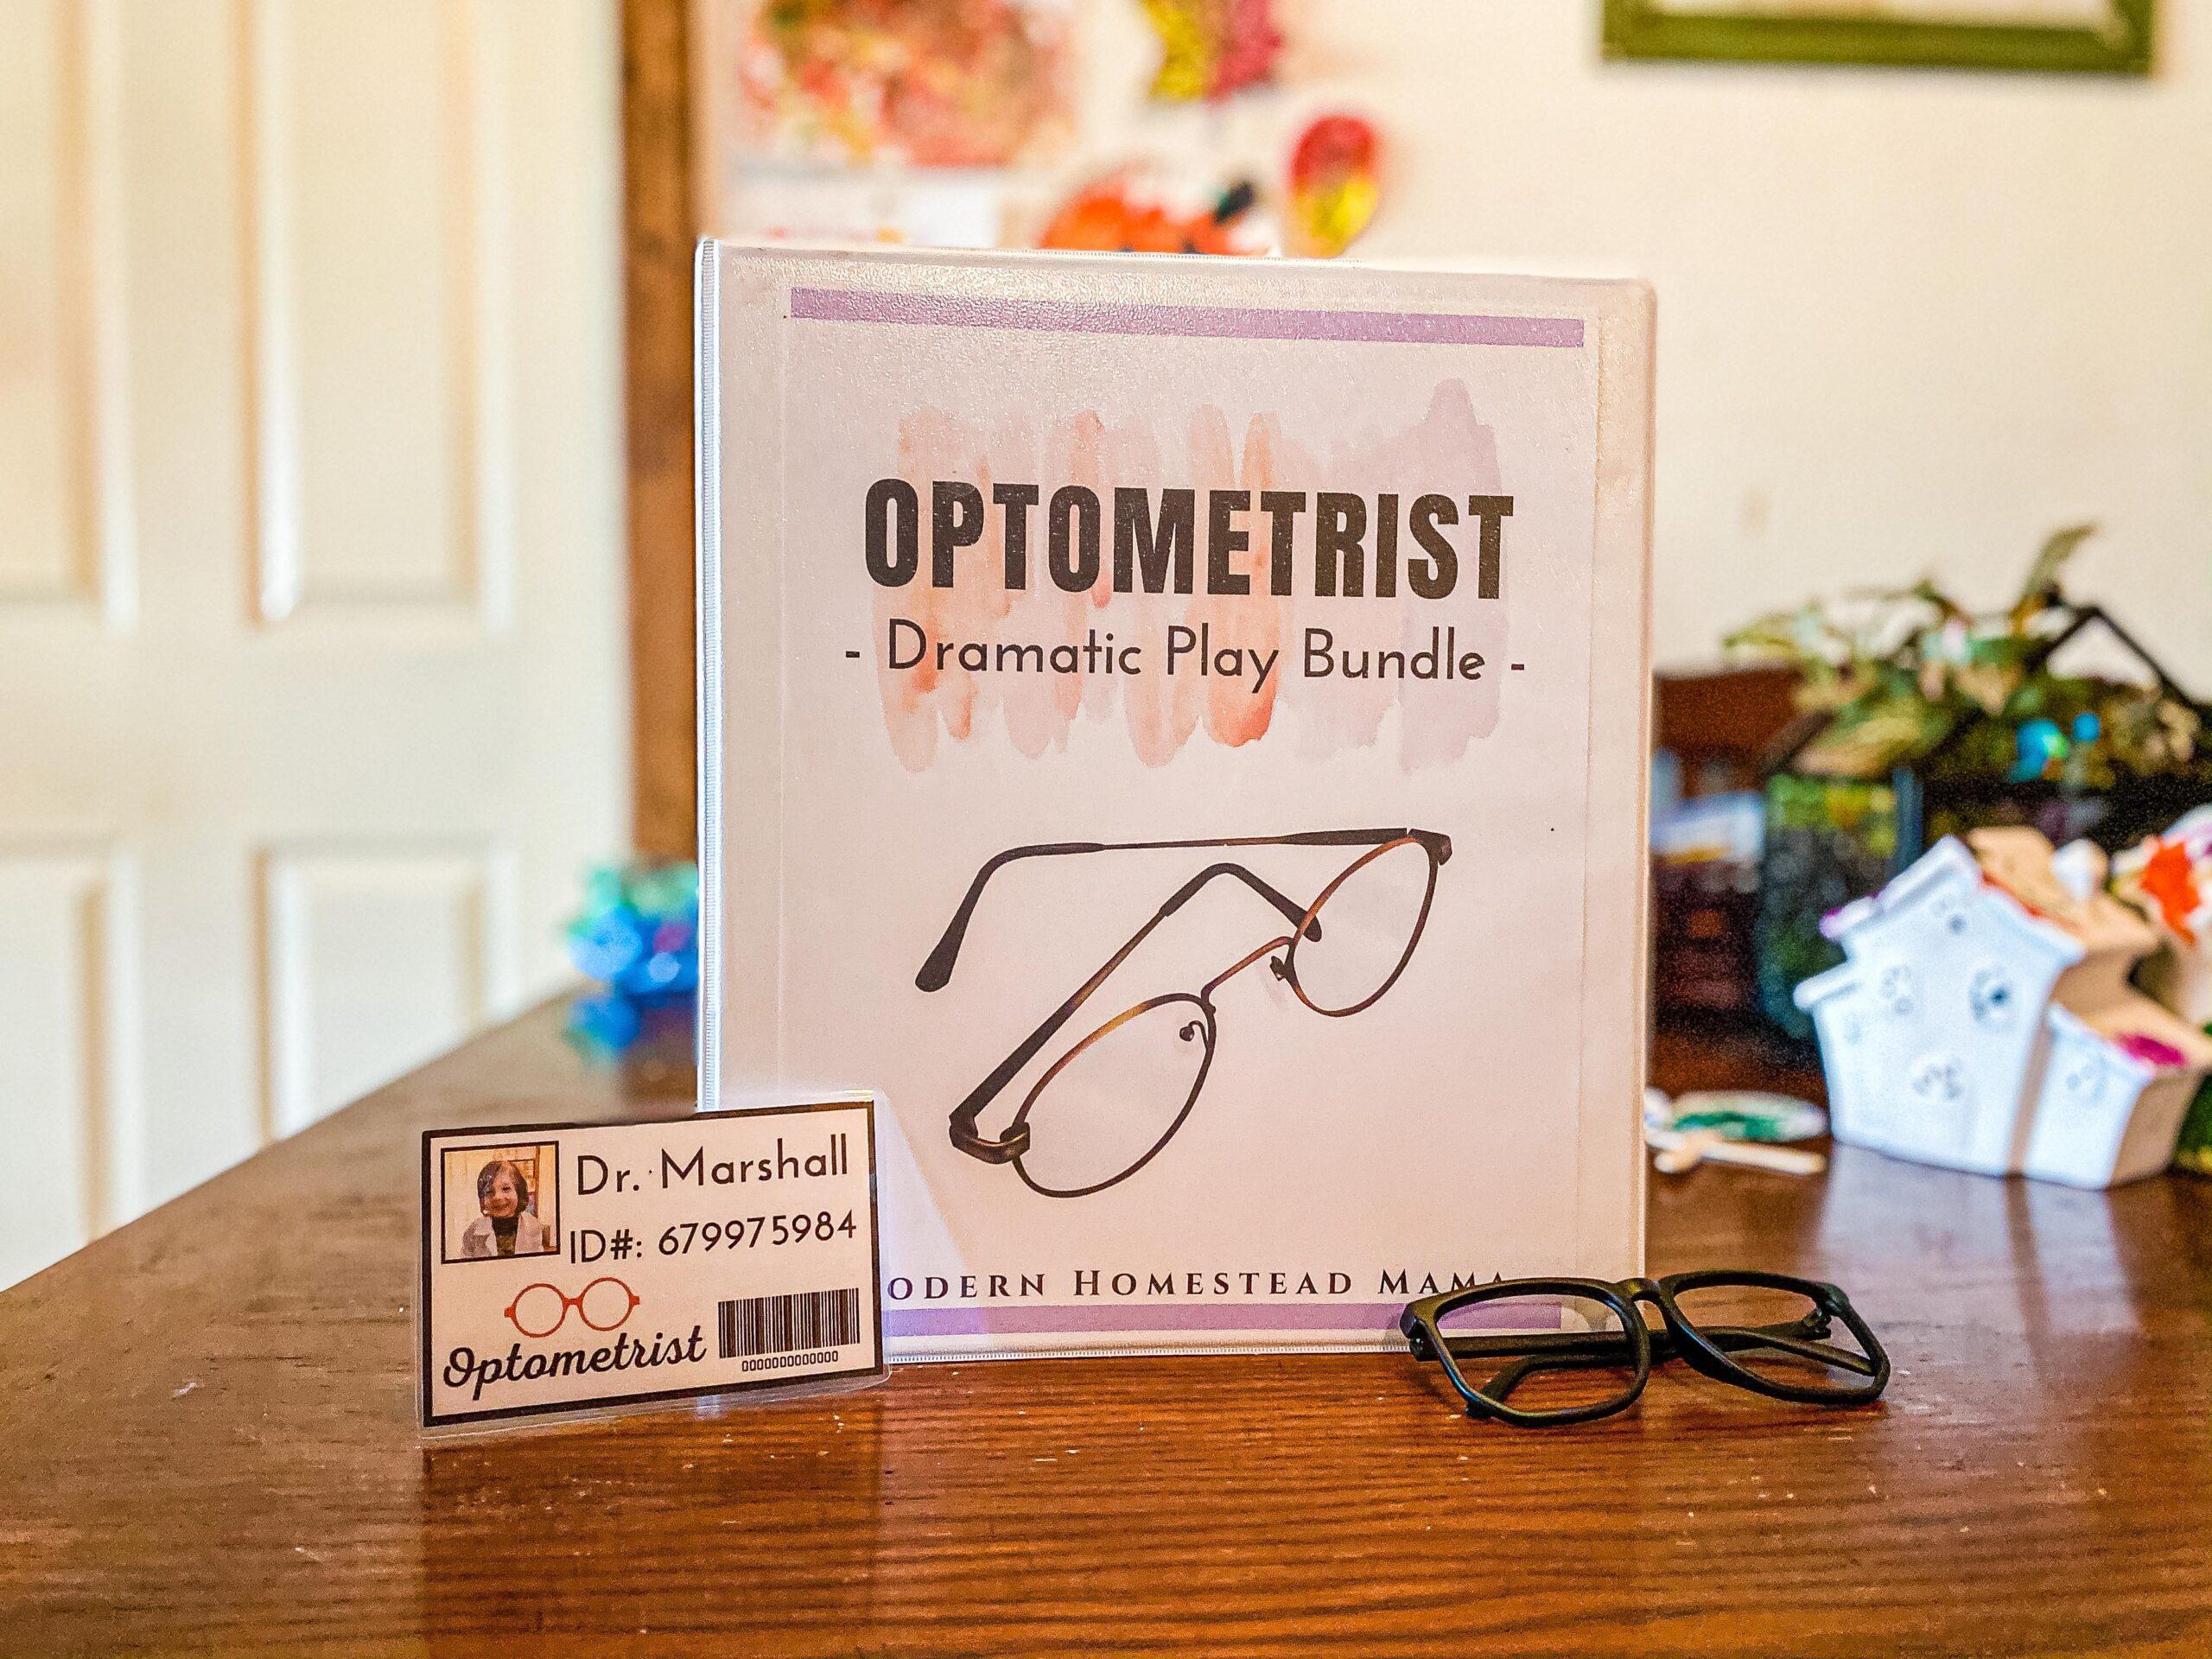 Optometrist Dramatic Play Bundle